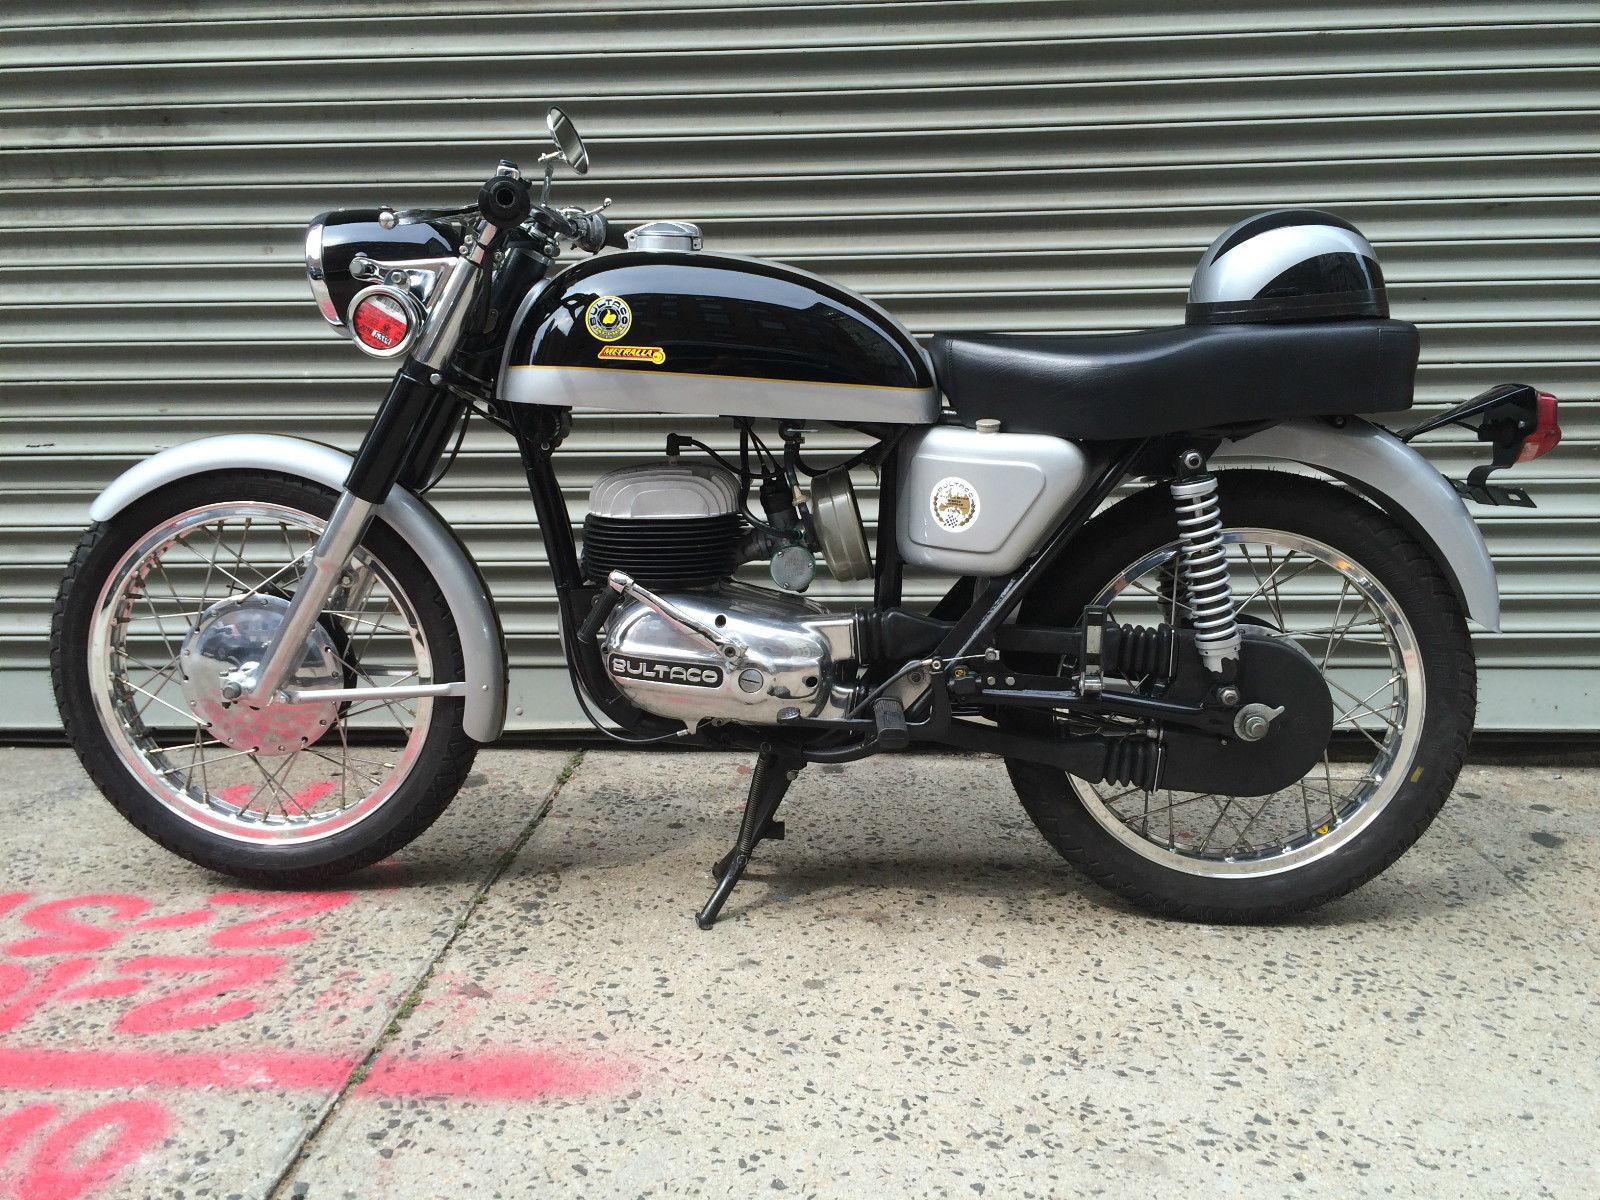 Restored Bultaco Metralla MK2 - 1969 Photographs at Classic